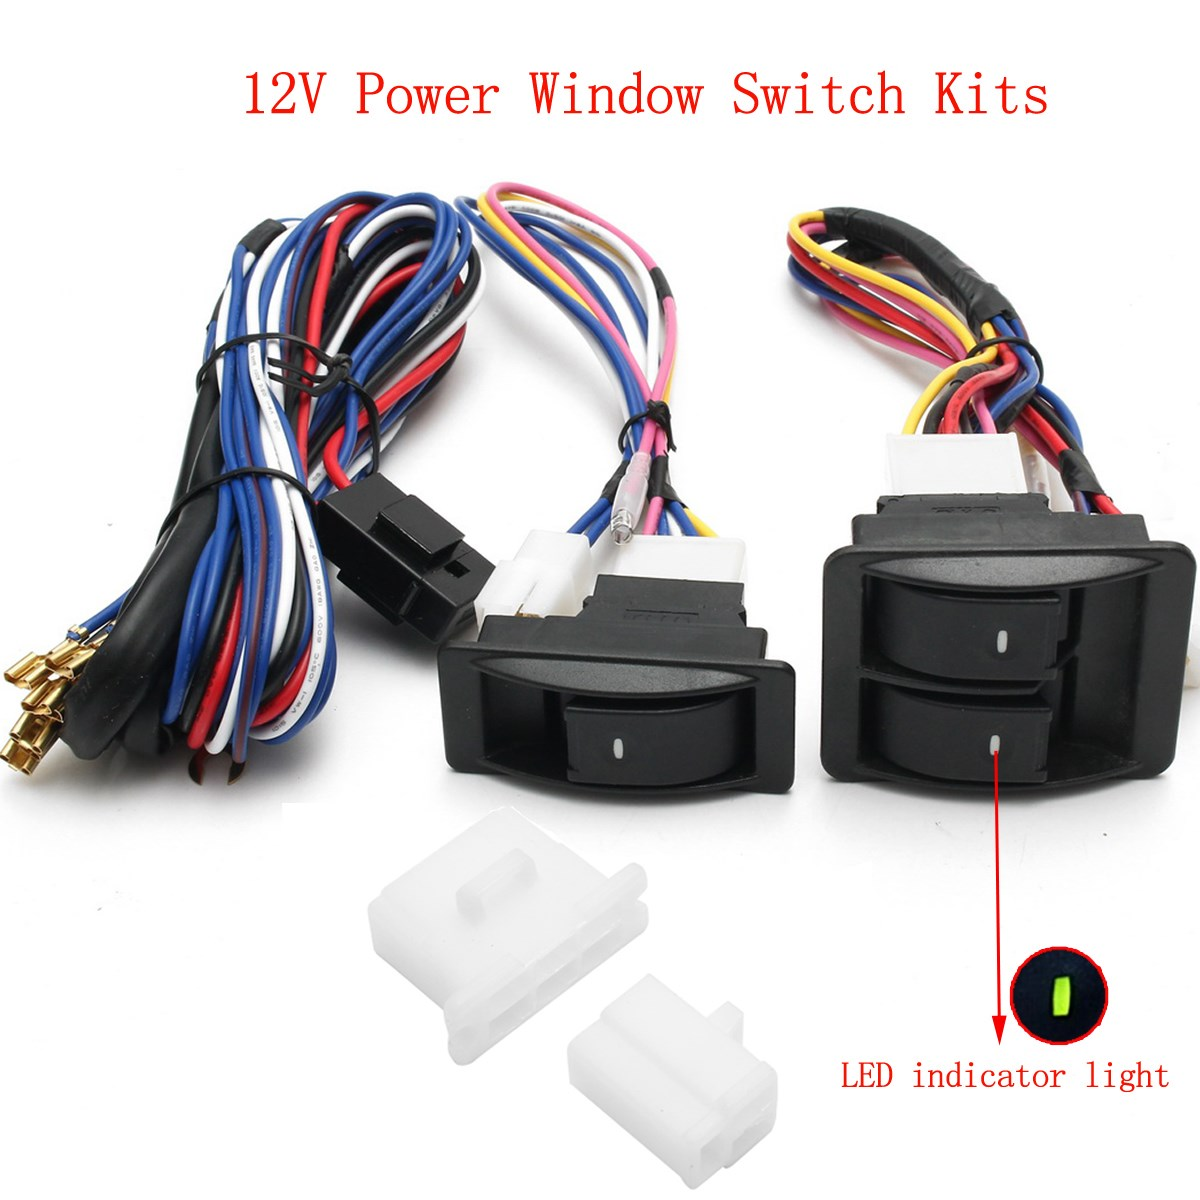 6pcs 12v universal power window switch kits with installation wiring harness [ 1200 x 1200 Pixel ]